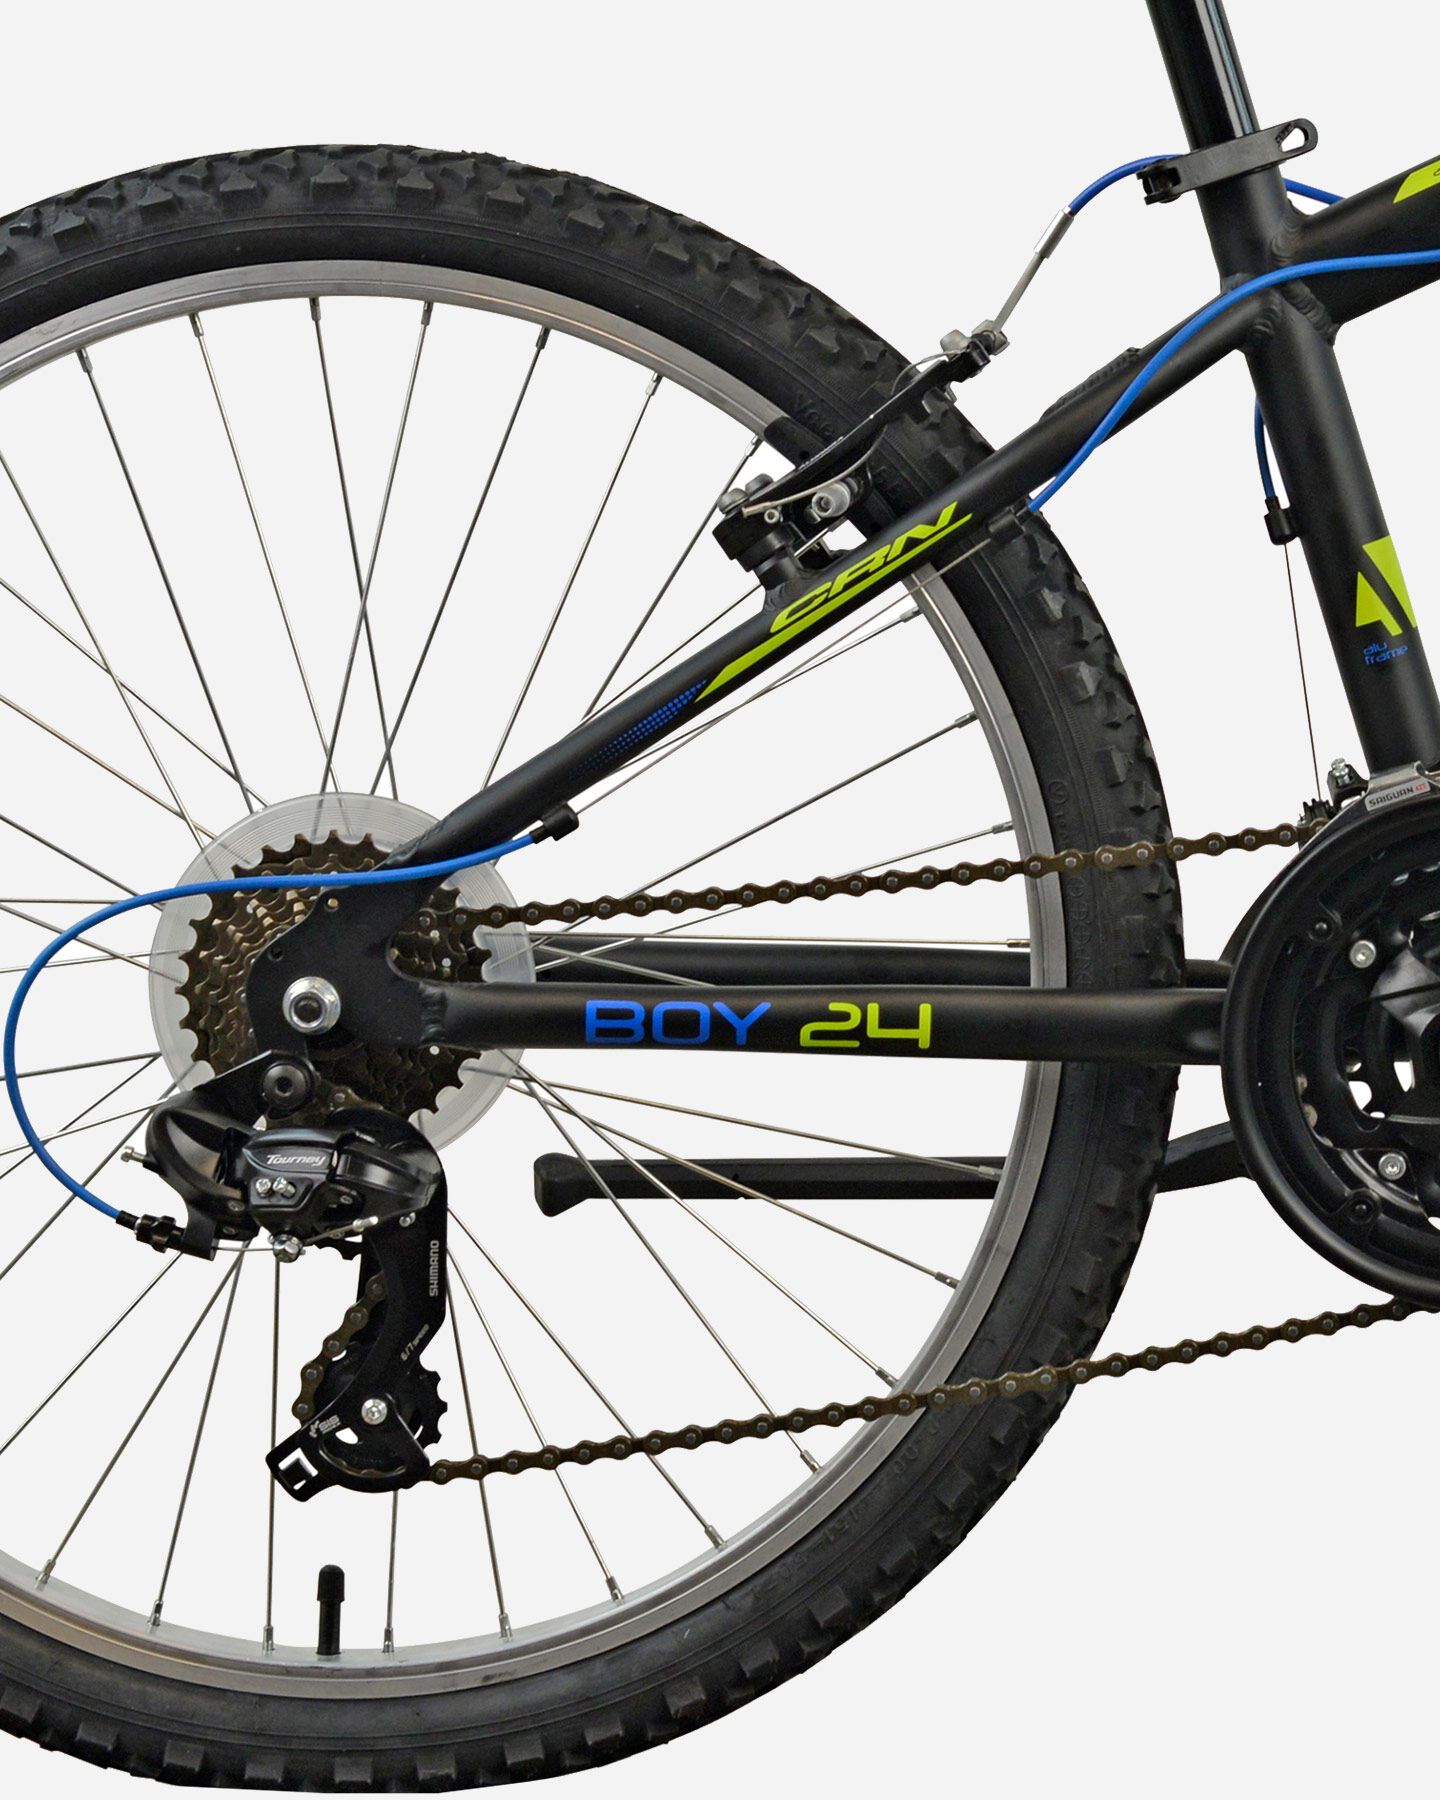 Bici junior CARNIELLI BIKE 24 JR S4081411|1|UNI scatto 1